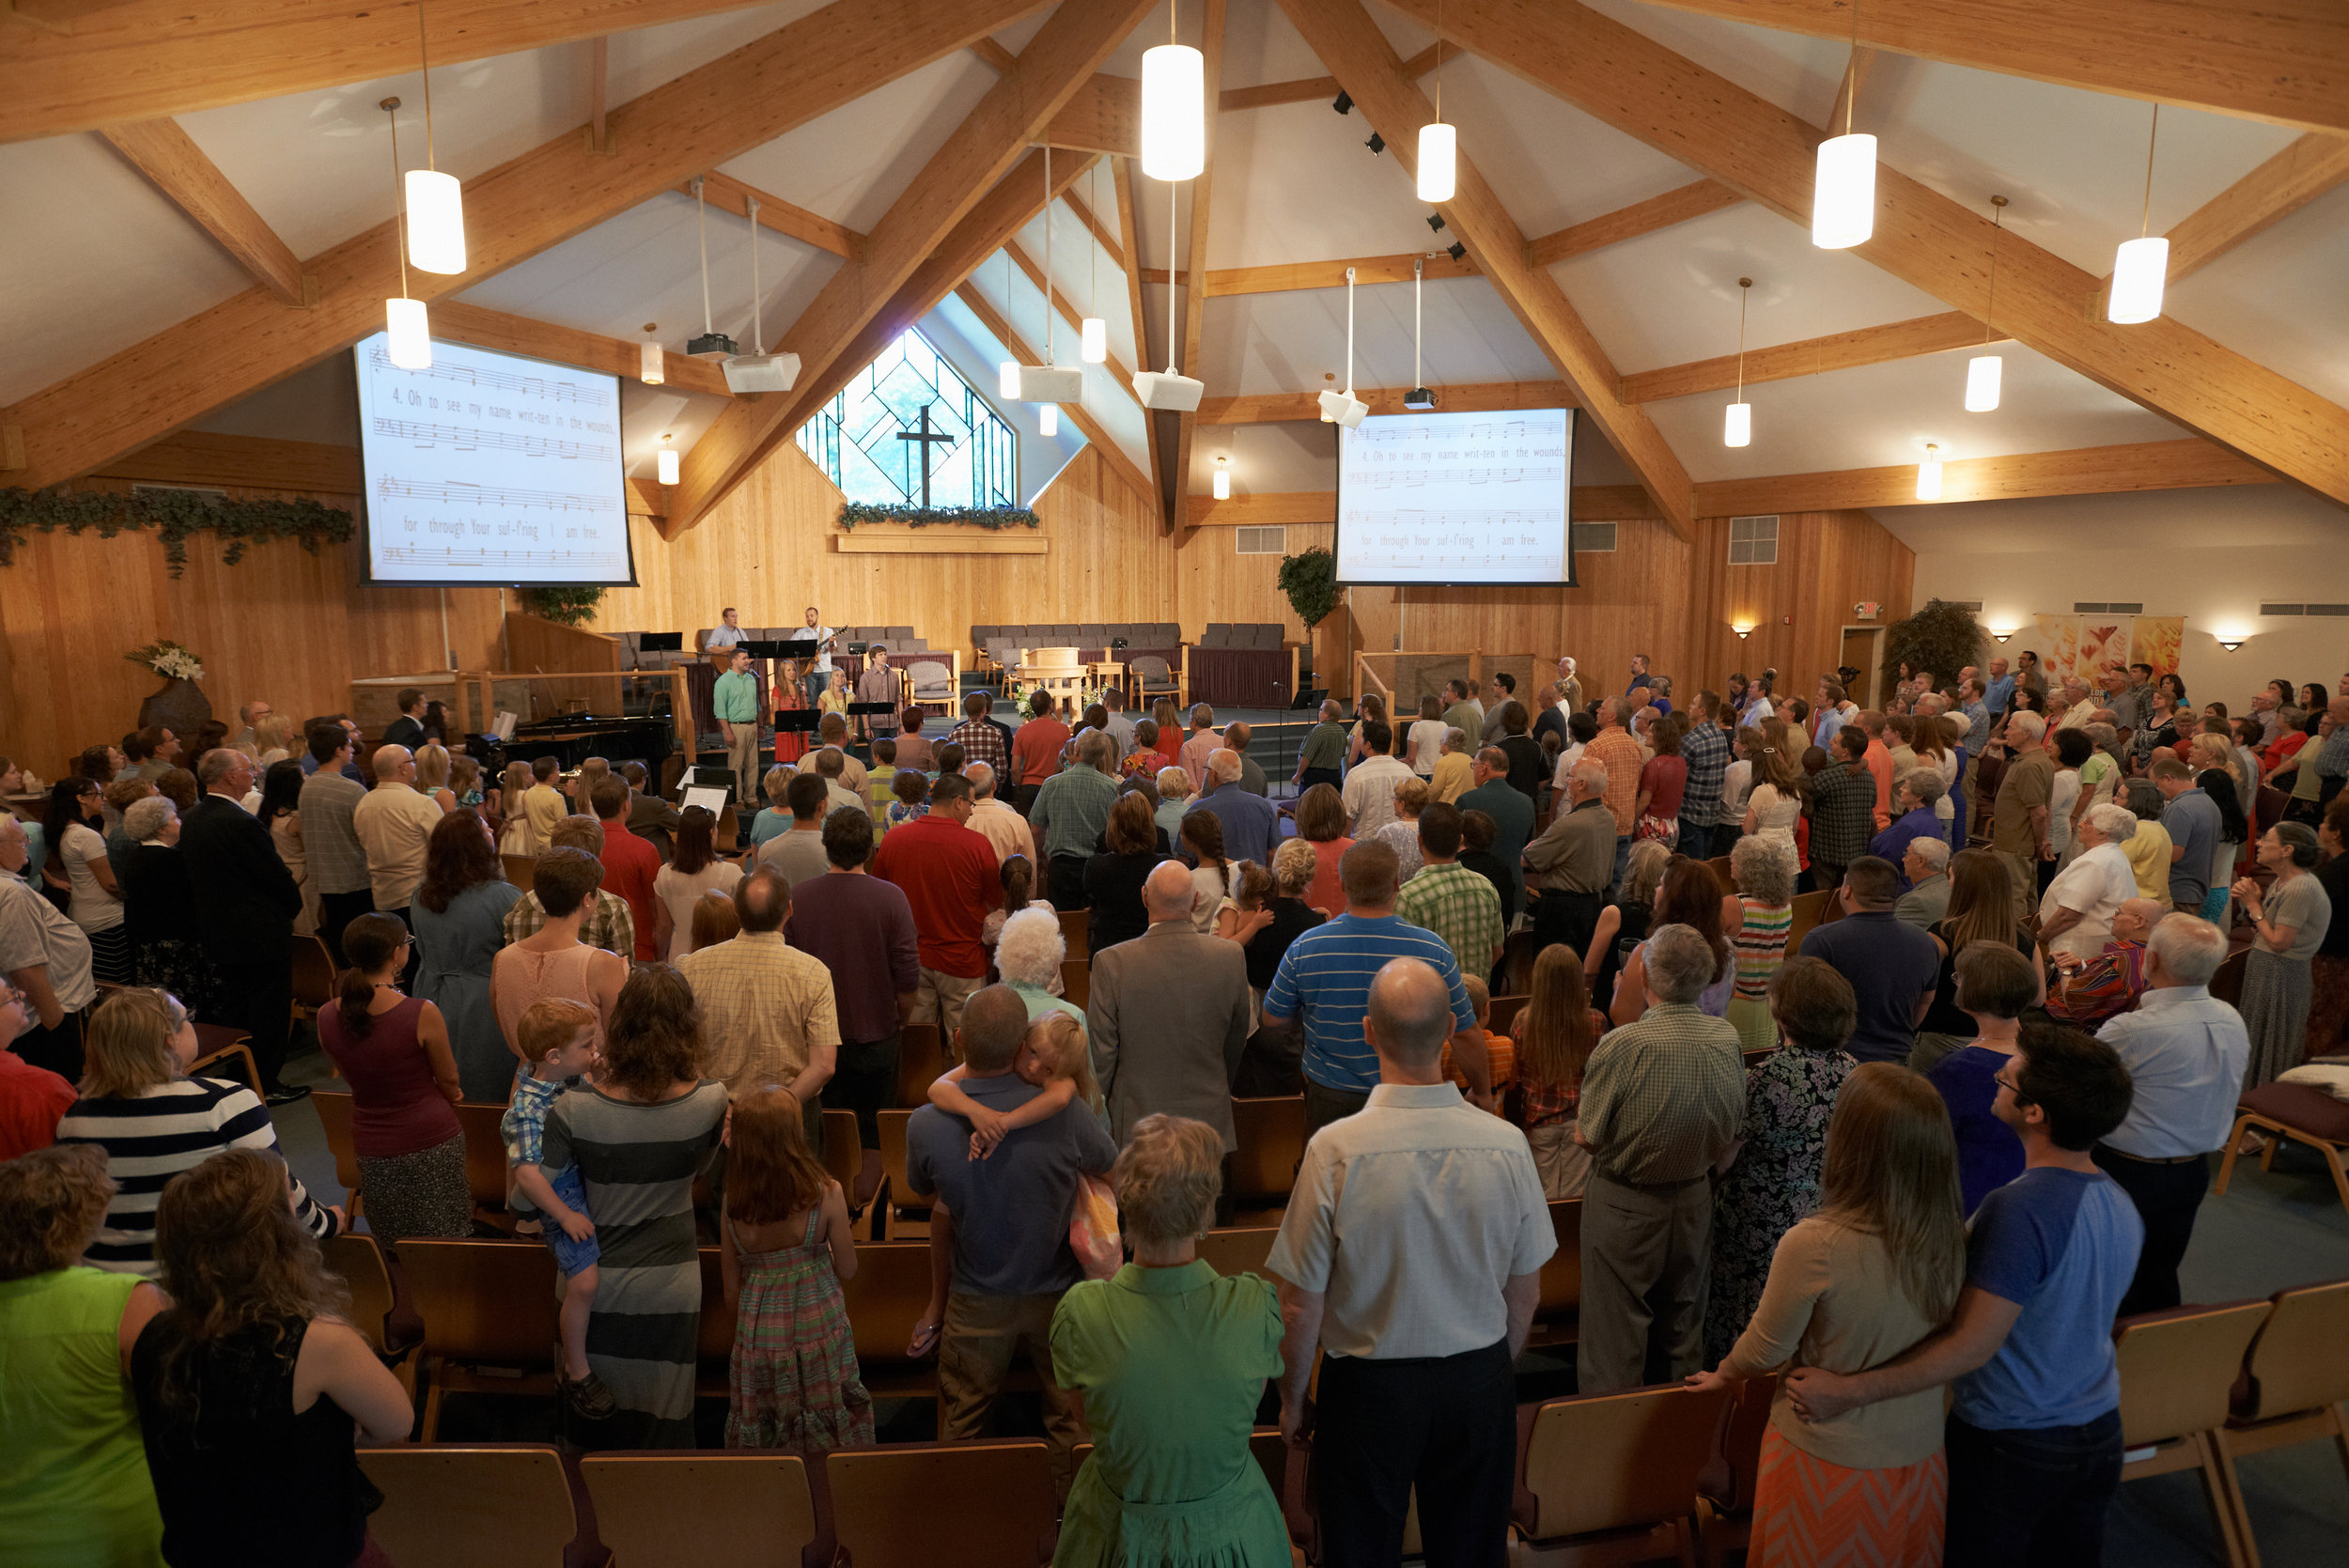 Lakeshore Baptist Church, Grand Haven, MI